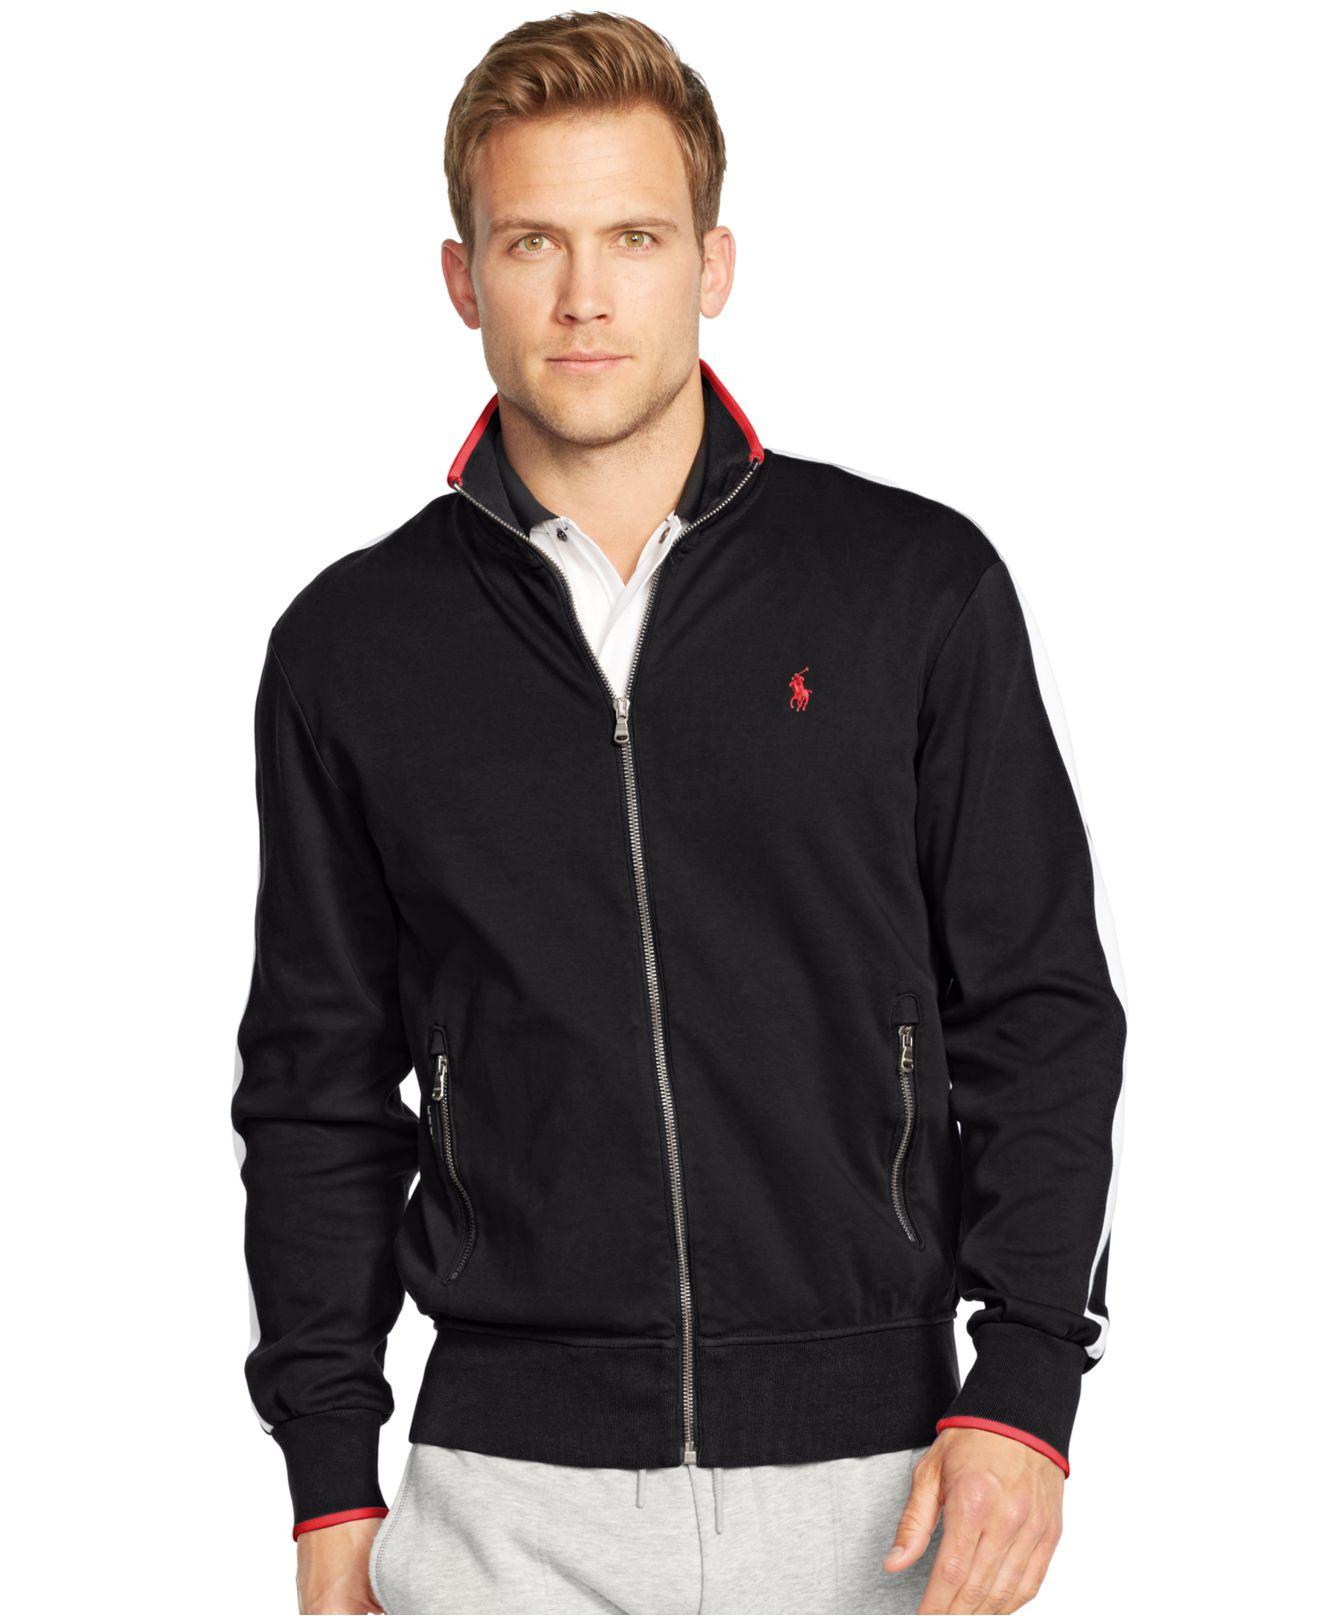 Shop Men's Polo Ralph Lauren Jackets on Lyst. Track over Polo Ralph Lauren Jackets for stock and sale updates.